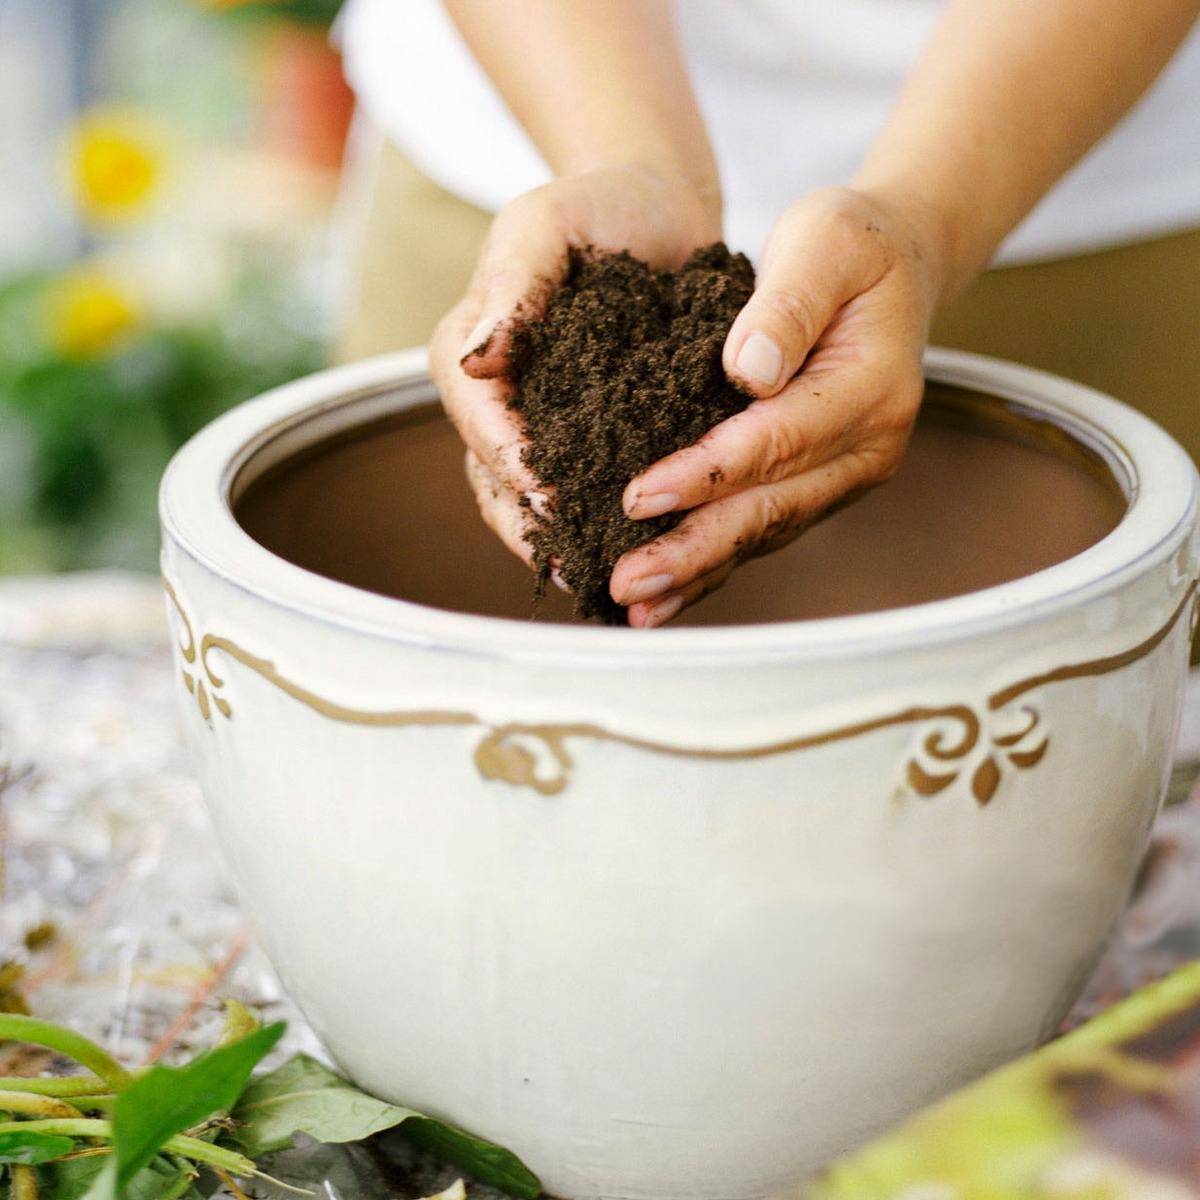 Best Potting Soil for Indoor Plants 2019